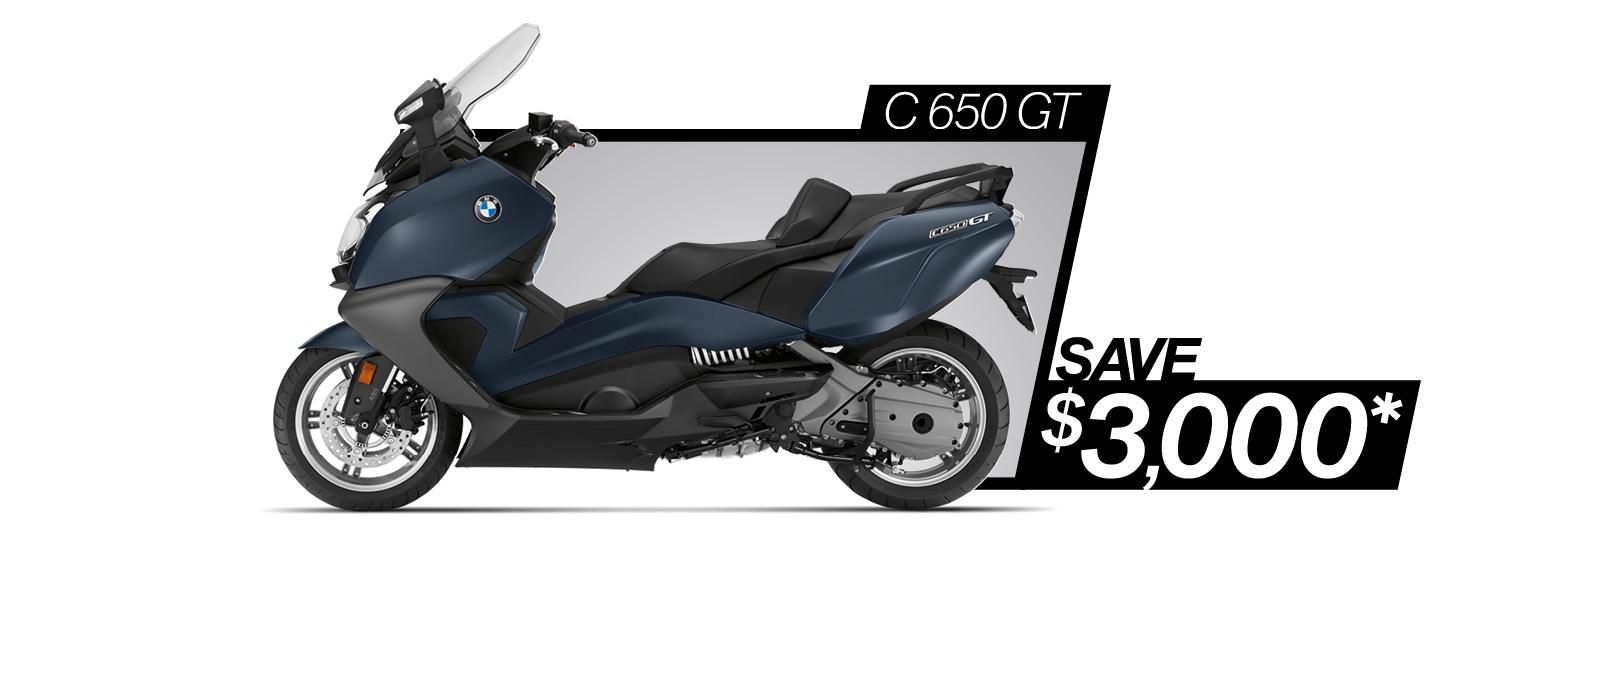 C 650 GT on sale